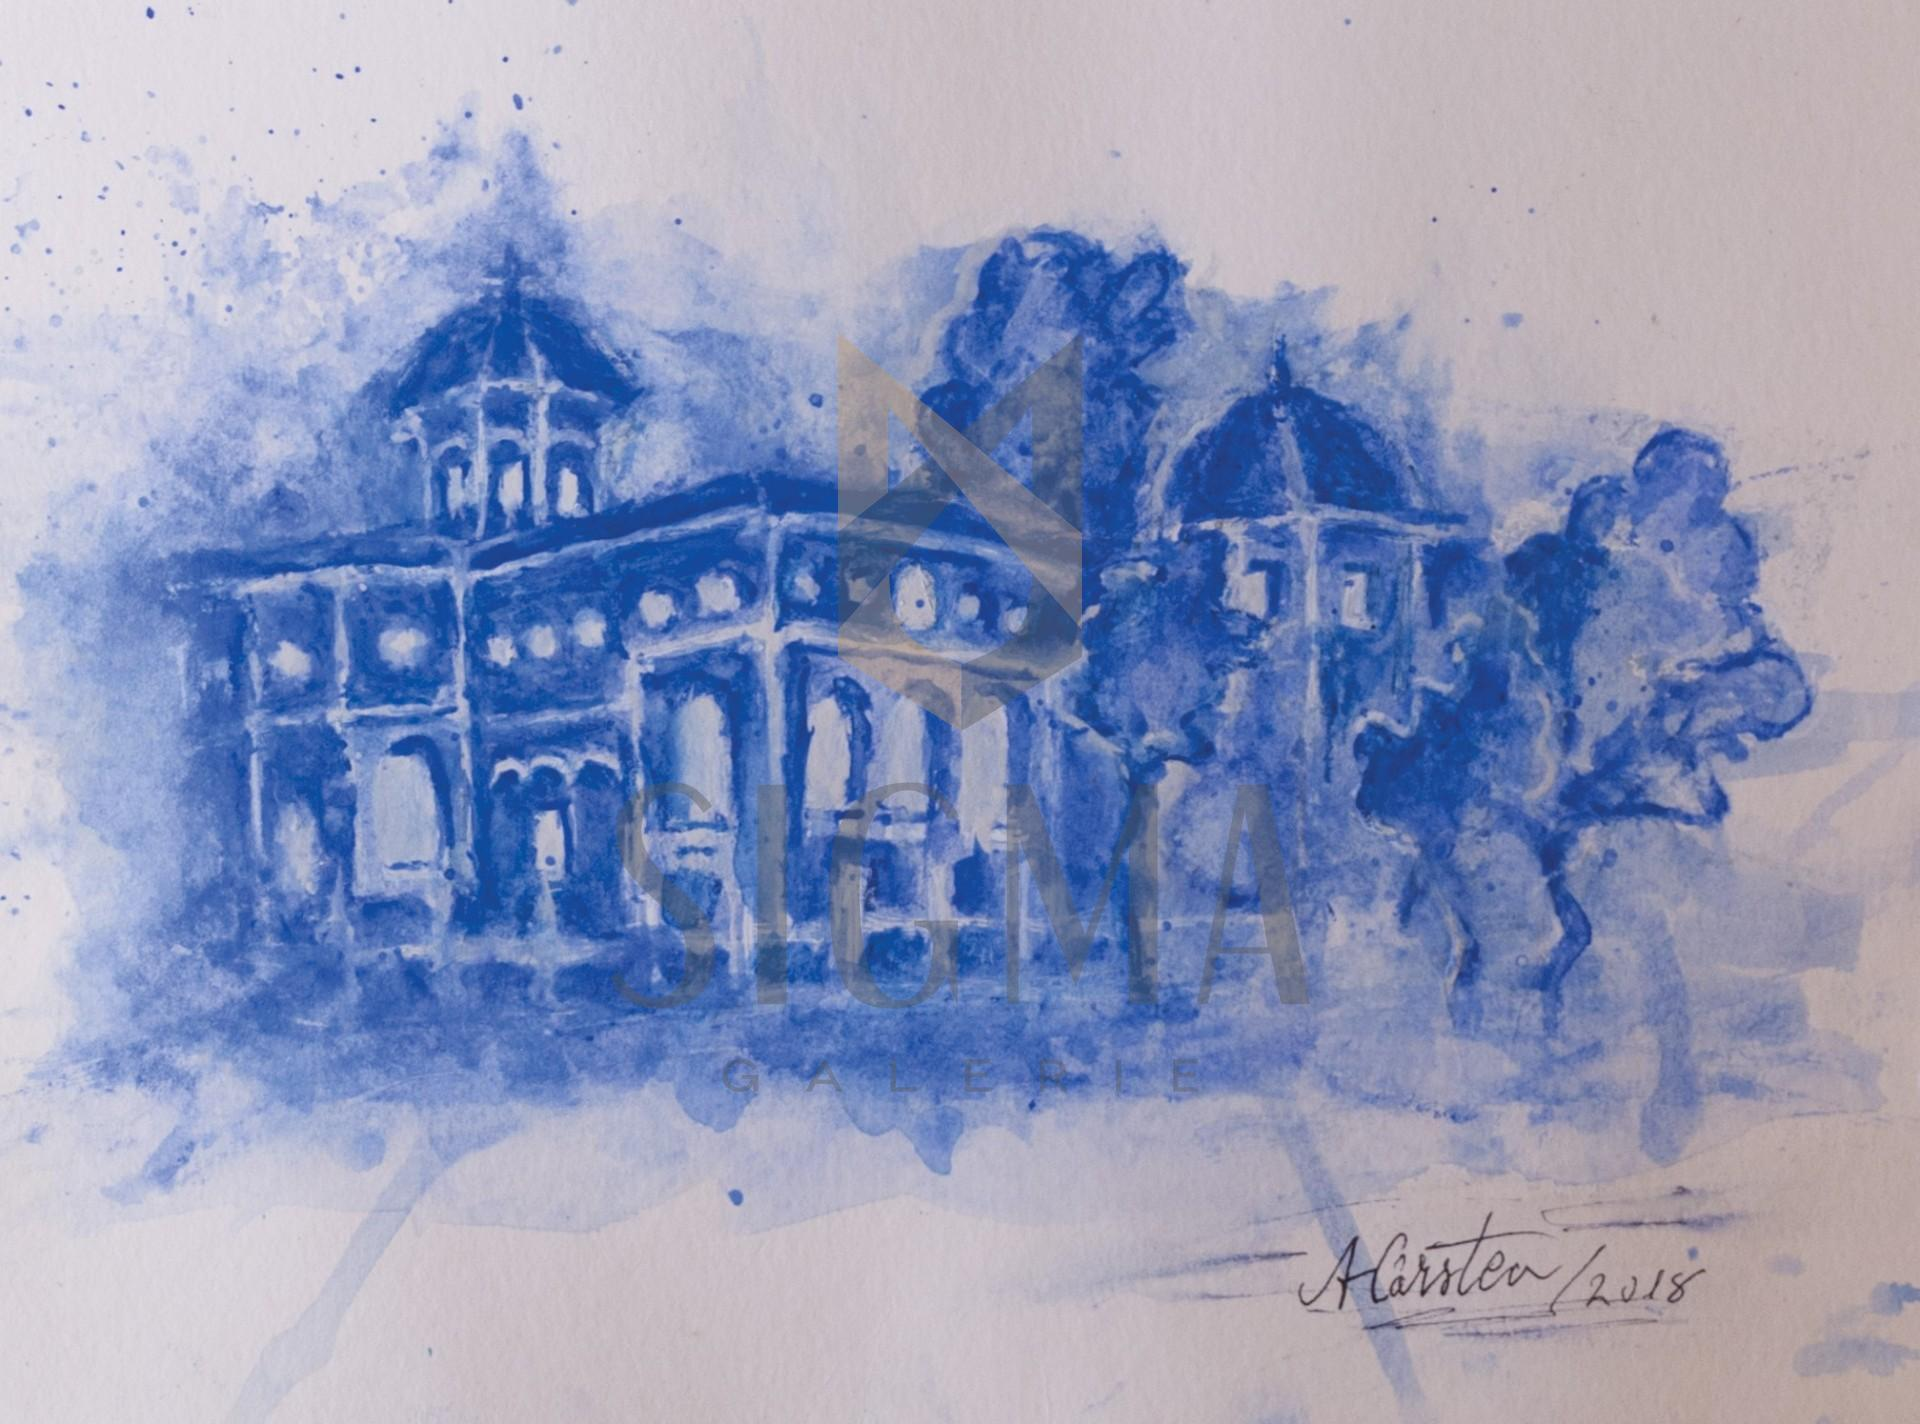 Tablou, Anca C. Cristea, - Albastrui - acuarela, 21x30 cm